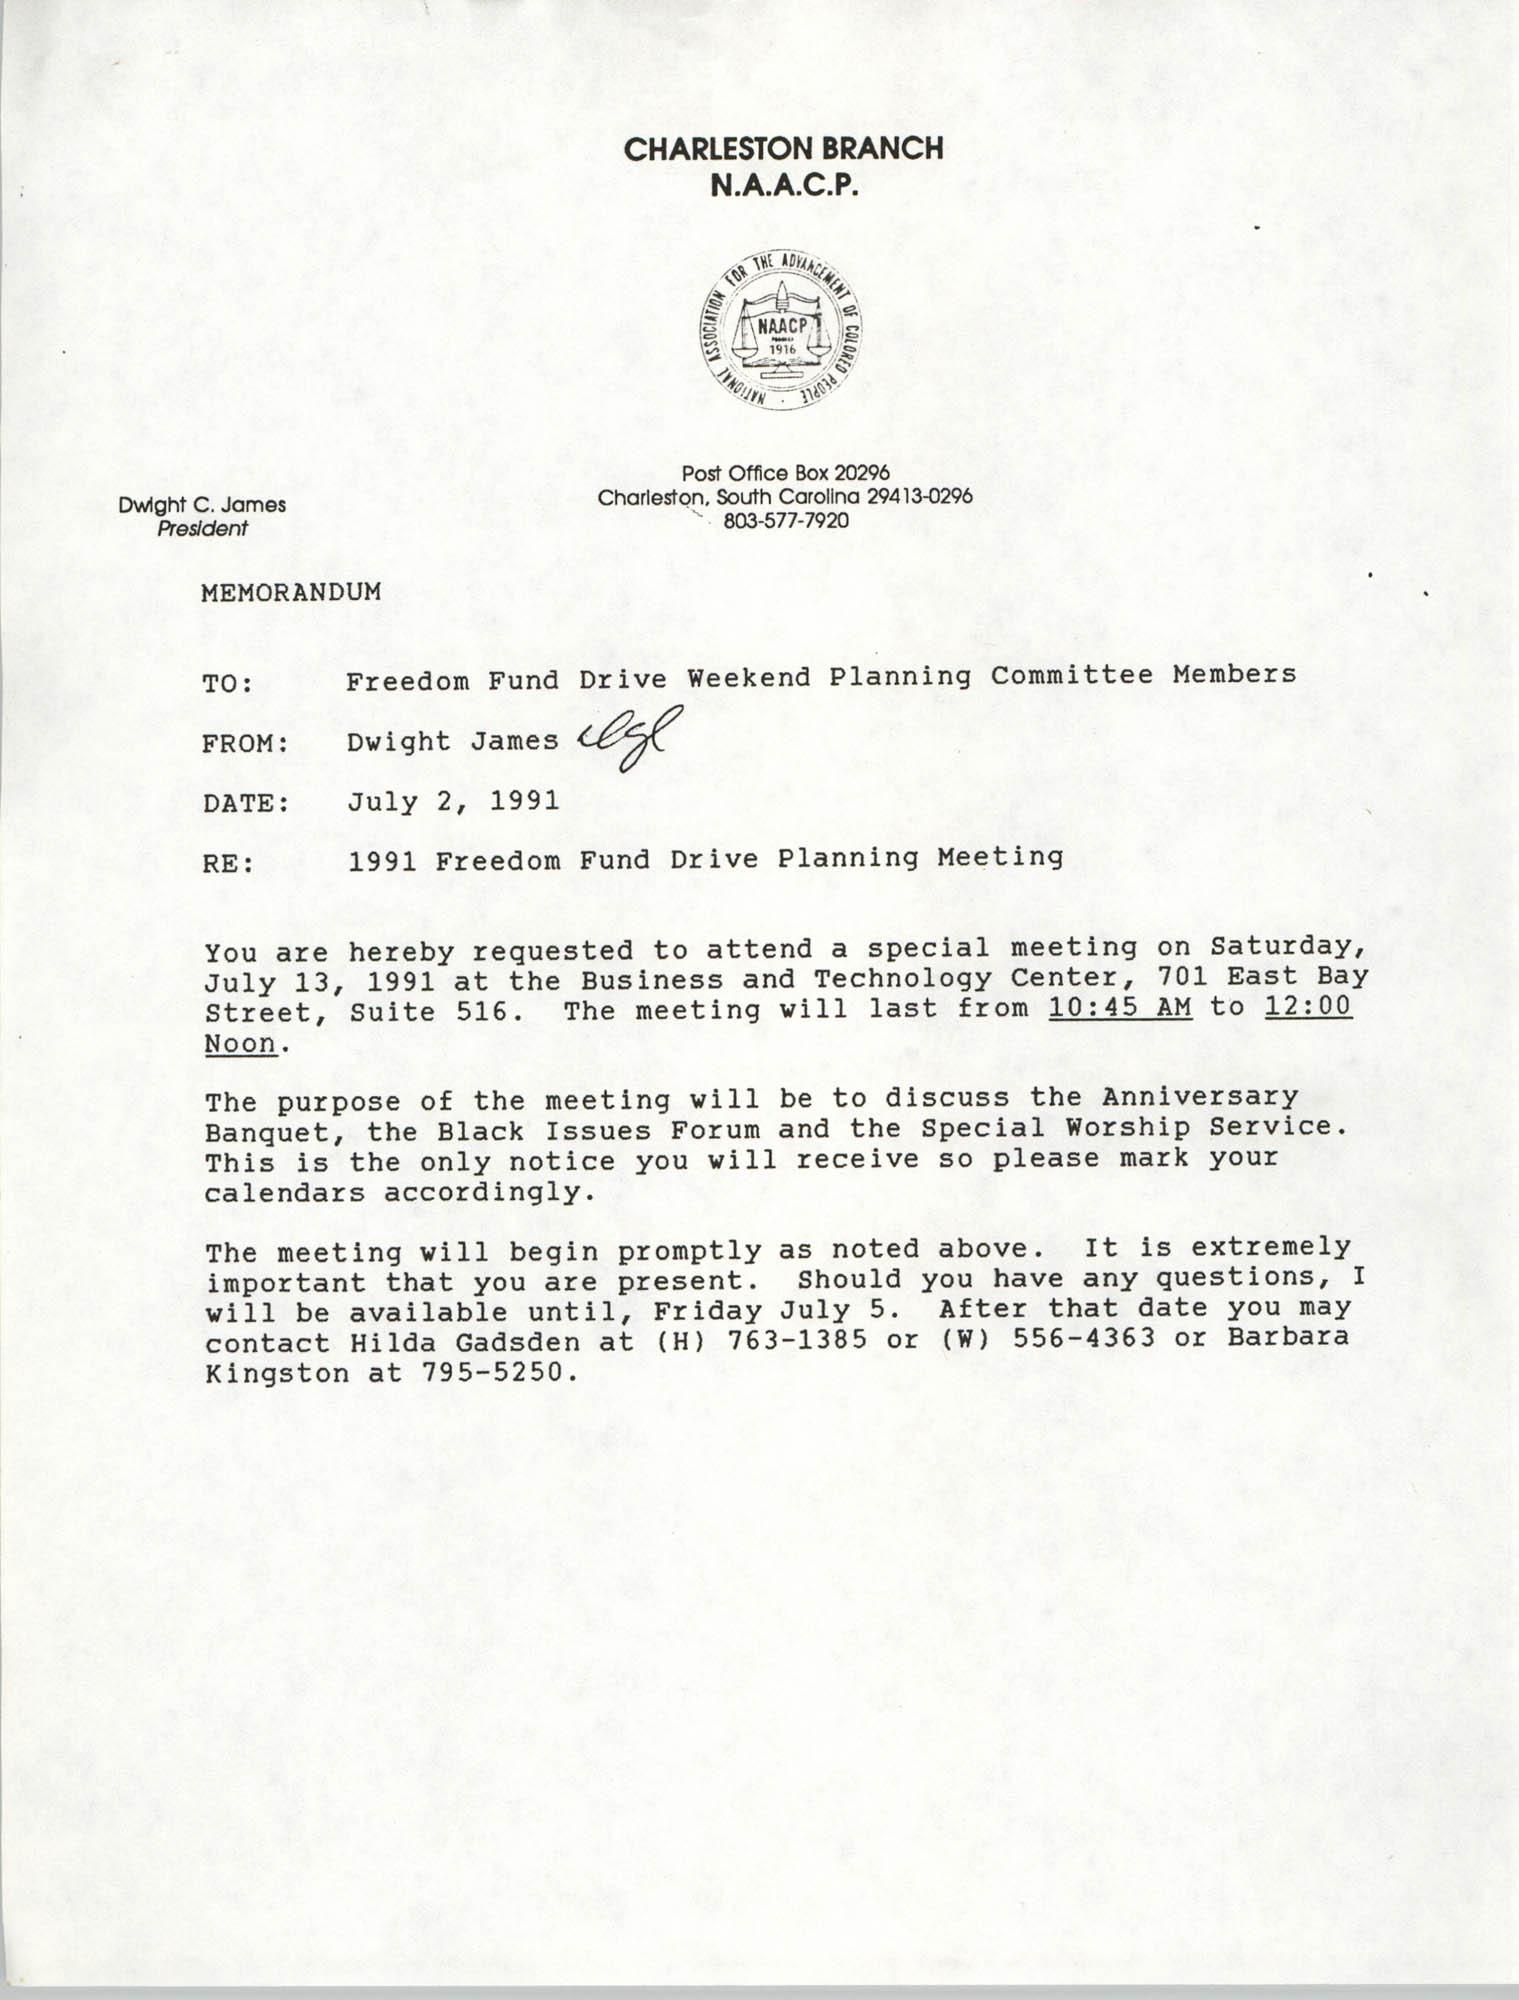 Memorandum, Dwight James, Freedom Fund Drive Planning Meeting, July 2, 1991